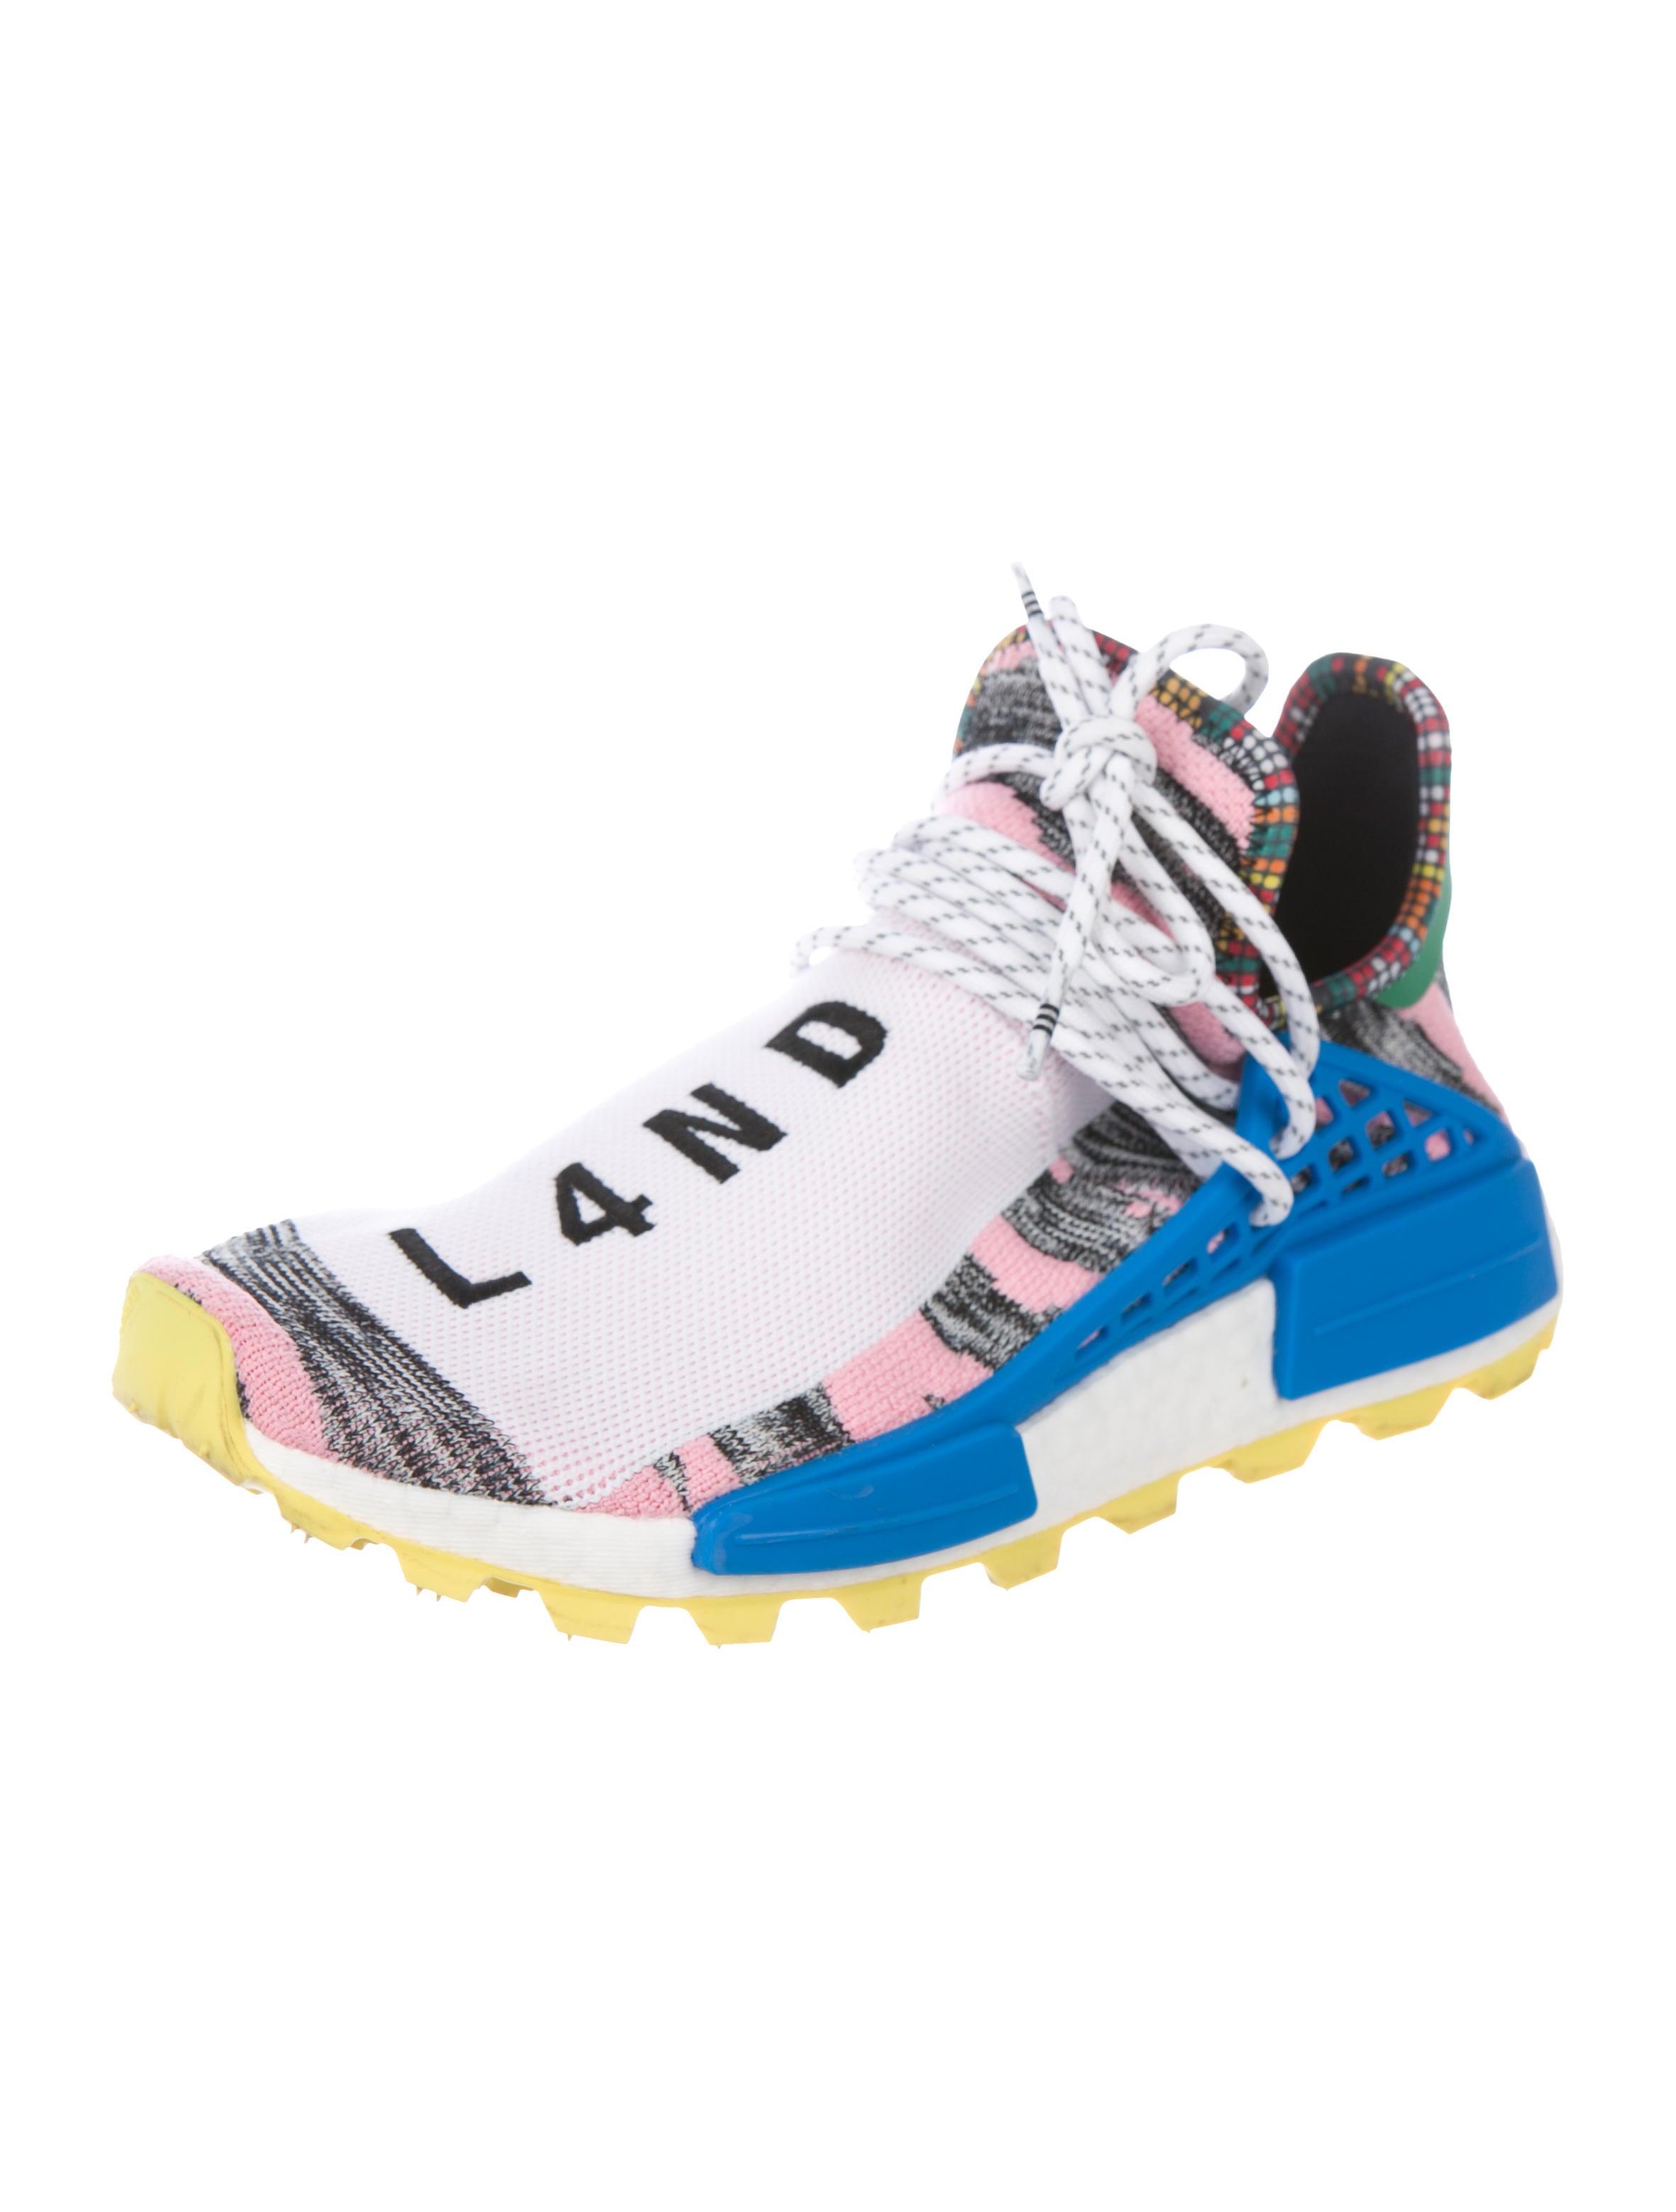 Pharrell Williams x Adidas NMD Human